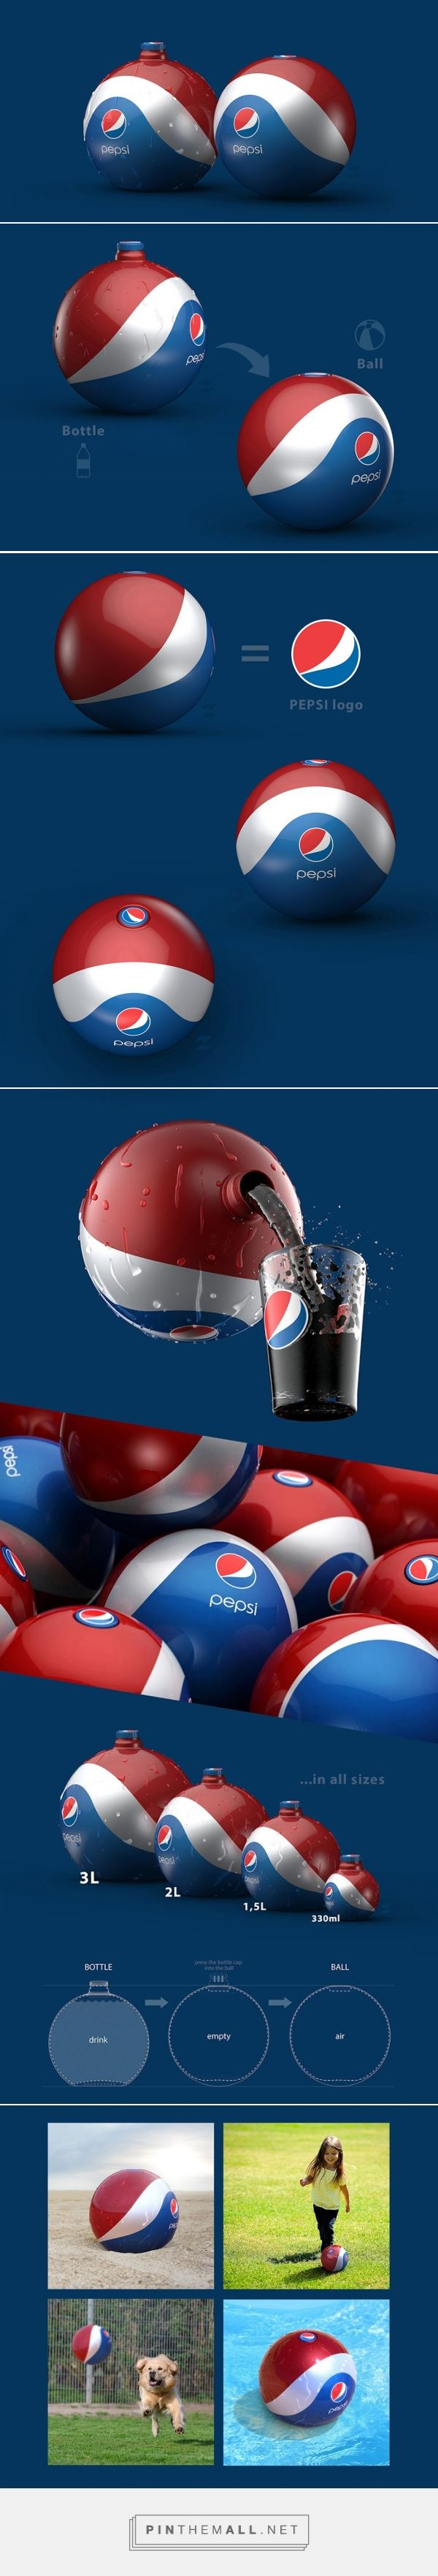 Pepsi Rubber Ball / Bottle Packaging Design Concept by Tomislav Zvonaric (Croatia) - http://www.packagingoftheworld.com/2016/04/pepsi-rubber-ball-bottle-concept.html - created via https://pinthemall.net